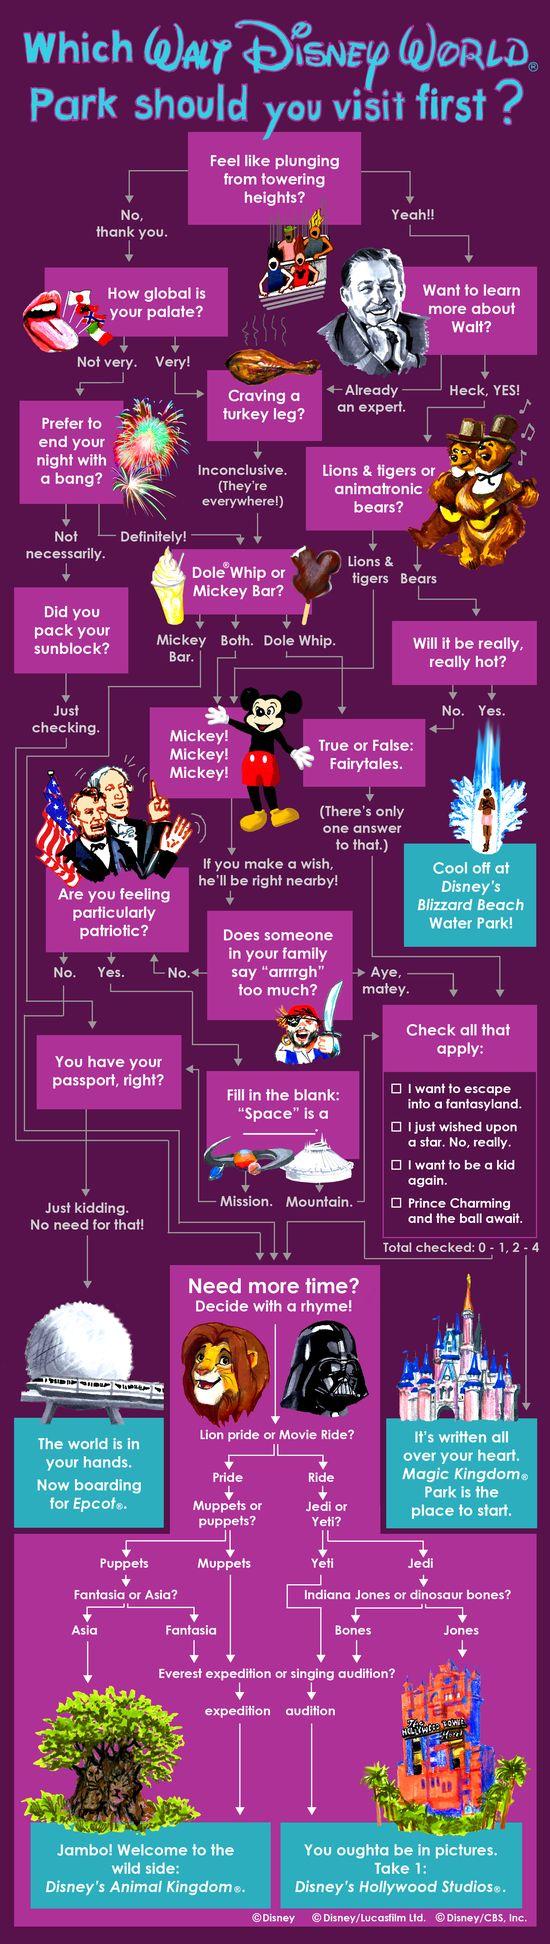 Which Walt Disney World Park should you visit first?